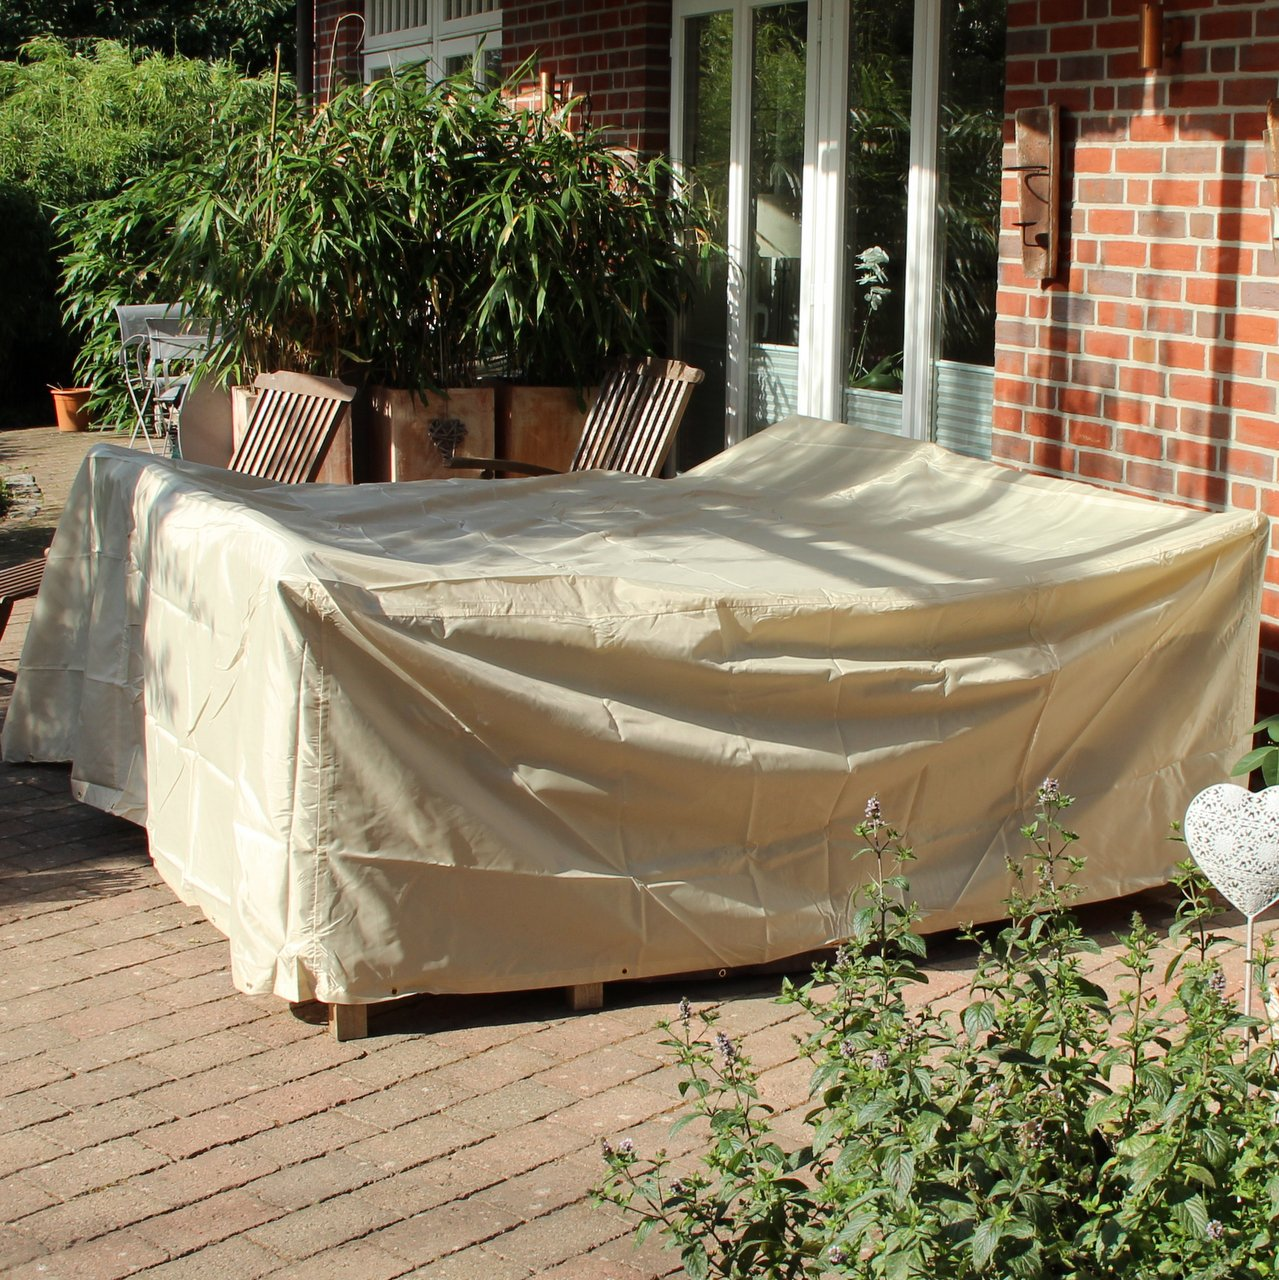 schutzh lle rechteckige tischgruppe abdeckung beige. Black Bedroom Furniture Sets. Home Design Ideas